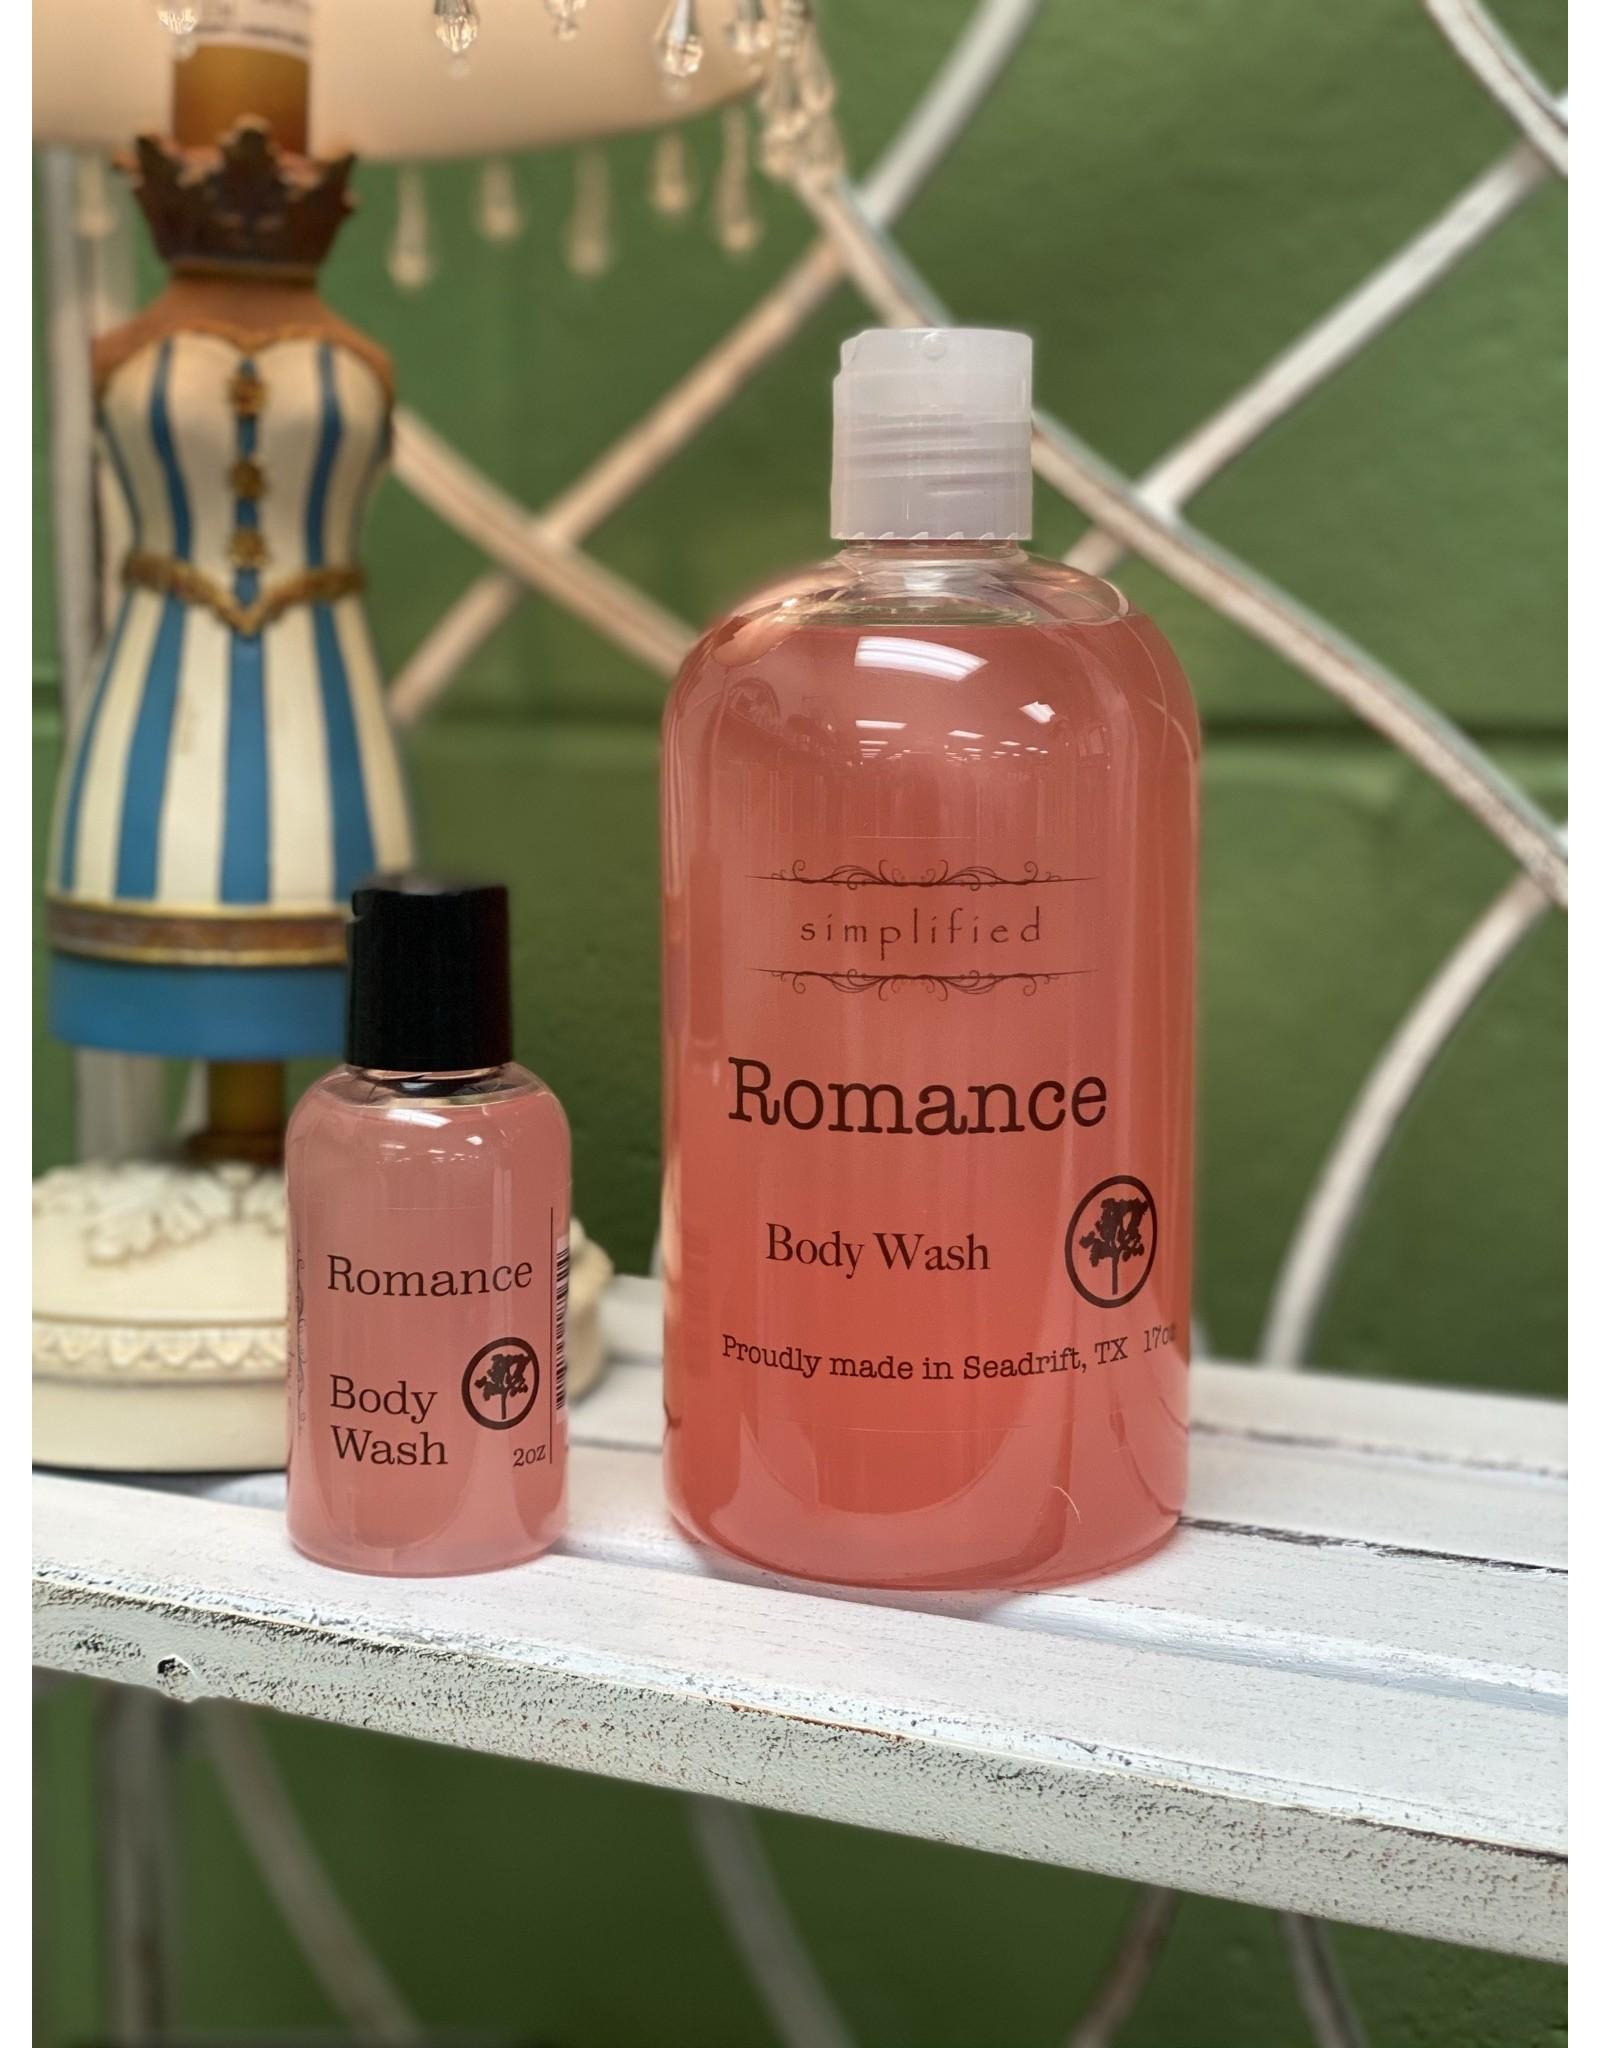 Romance Body Wash 2oz